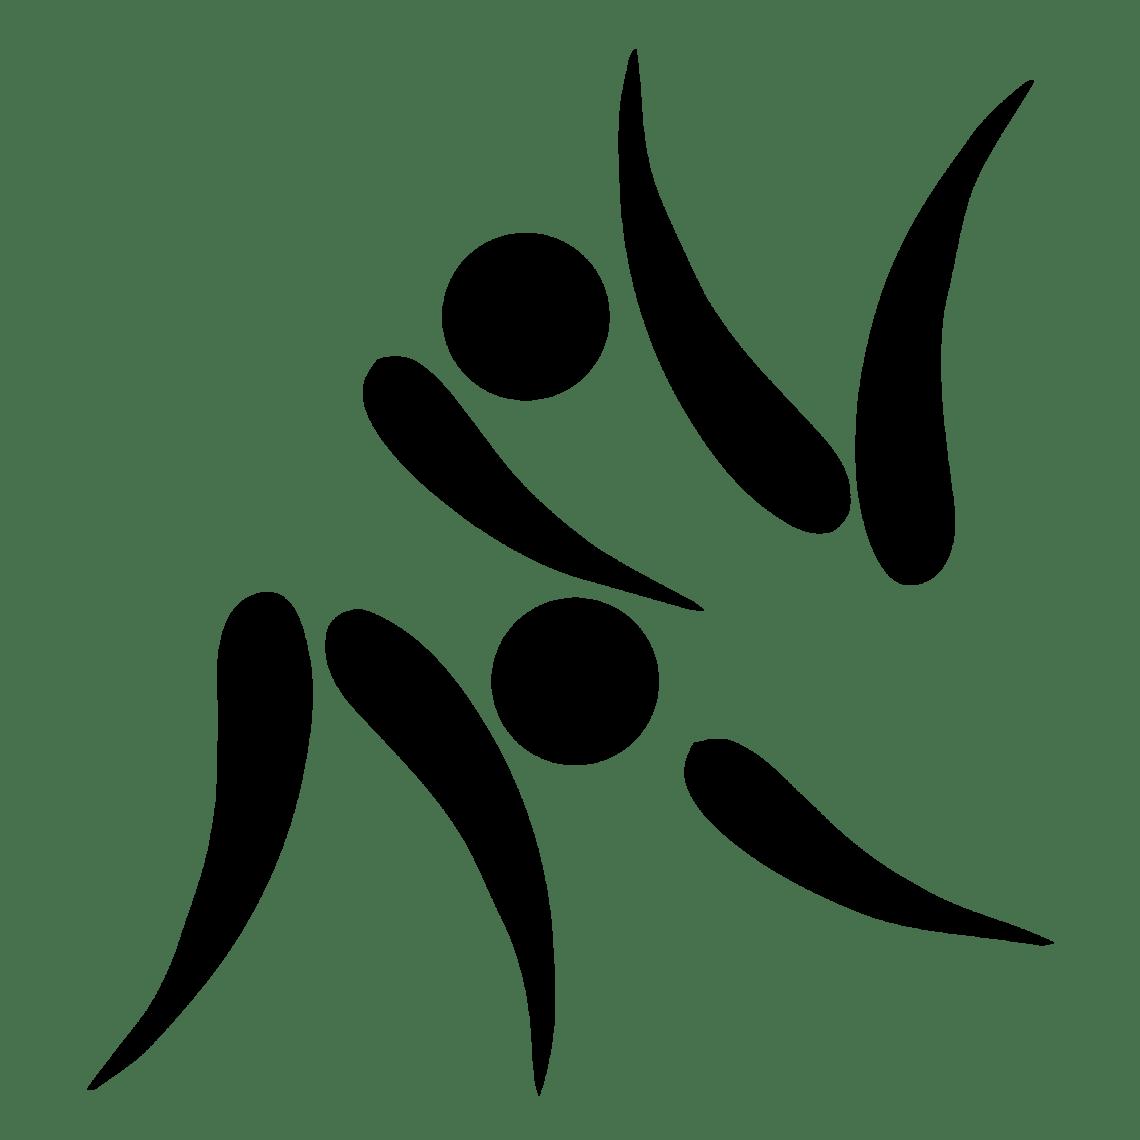 2000px-Judo_pictogram.svg.png